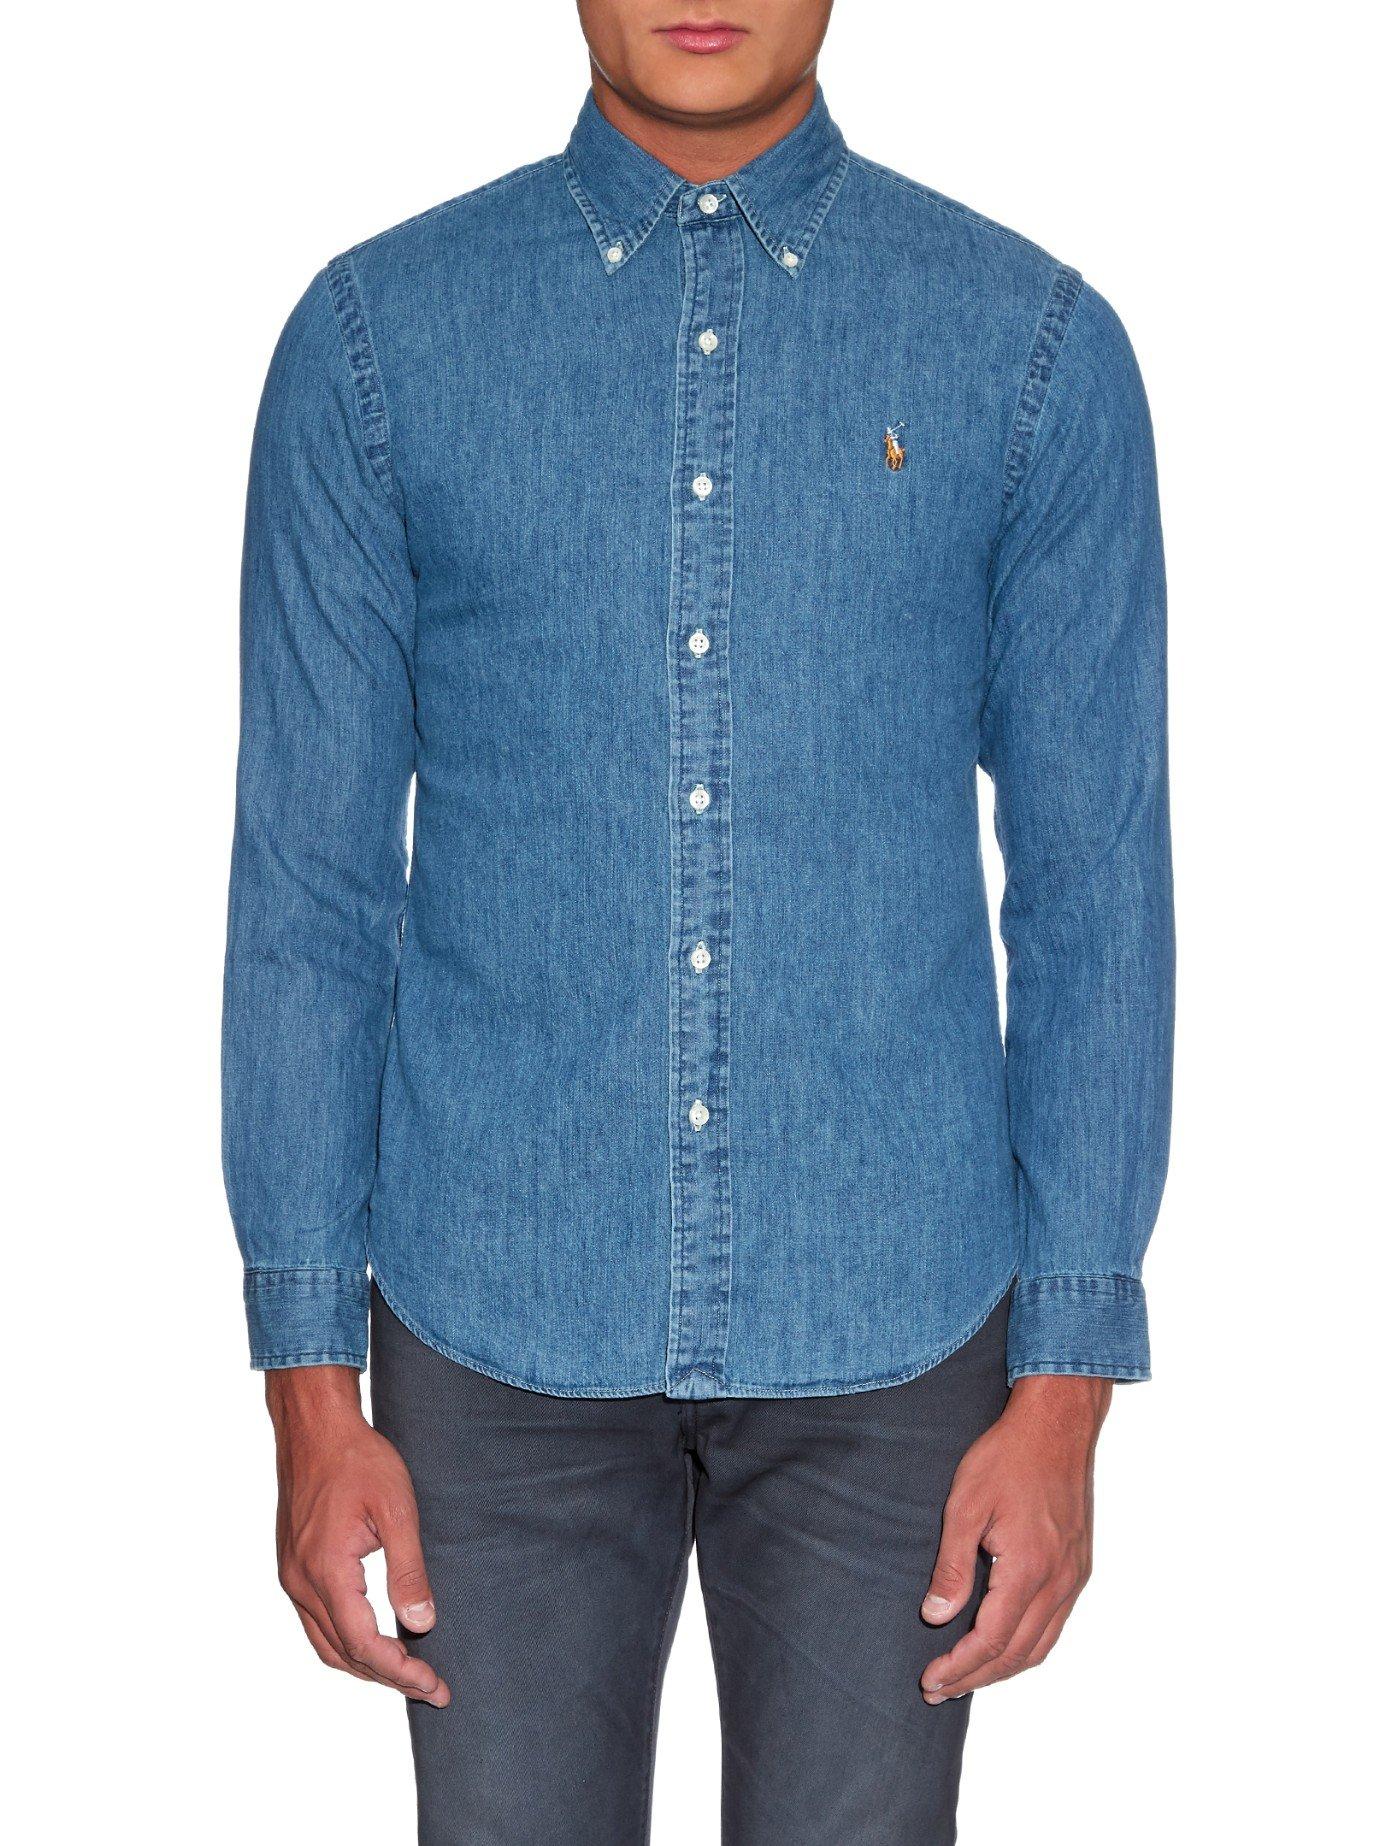 Polo Ralph Lauren Slim Fit Denim Shirt In Blue For Men Lyst